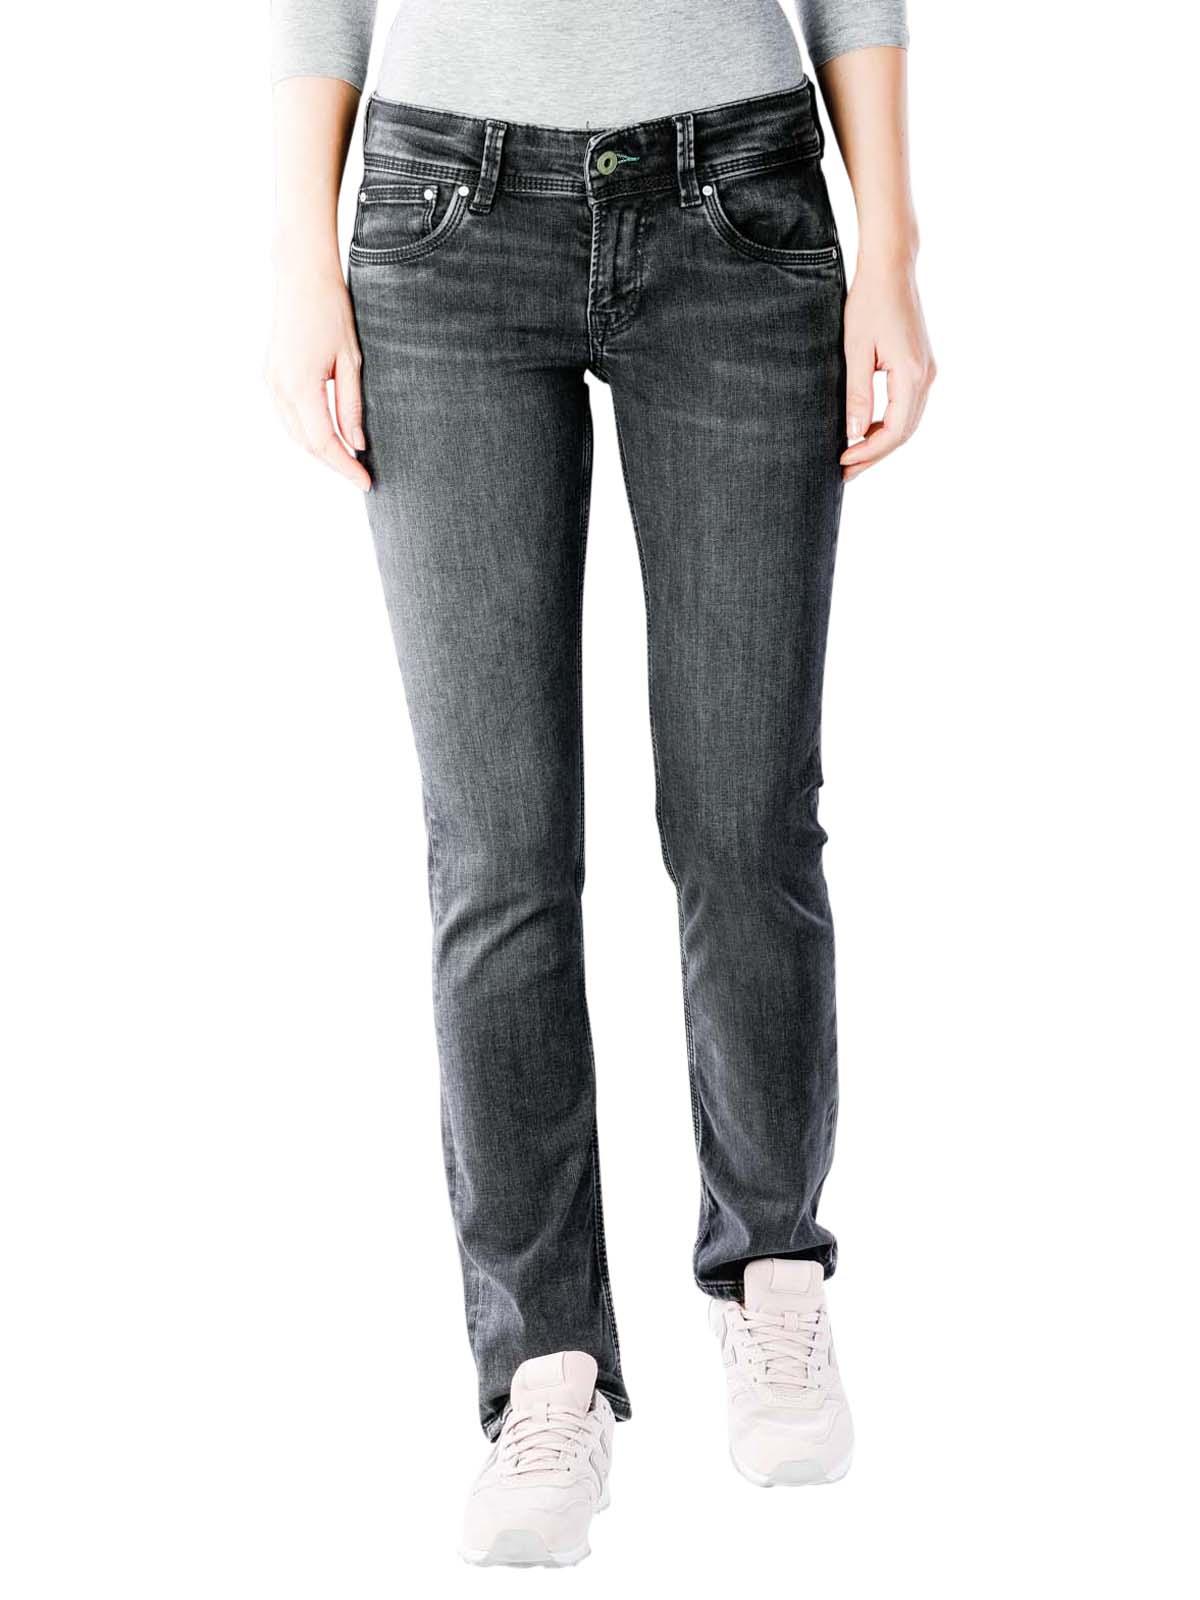 online retailer 840c4 cdfc8 Pepe Jeans Saturn black wiser wash Pepe Jeans Women's Jeans ...